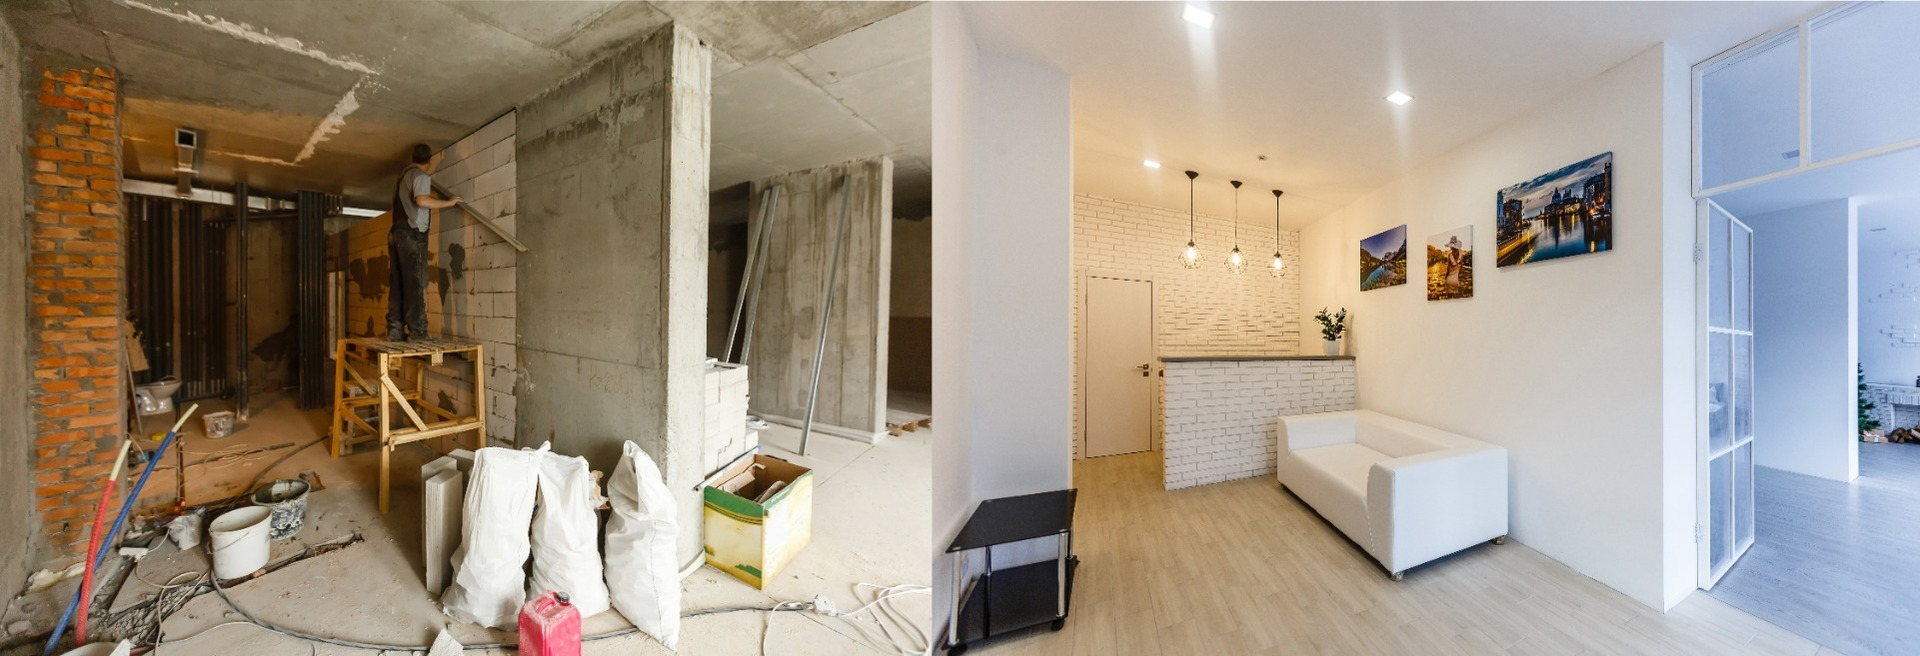 rénovation maison Grenoble